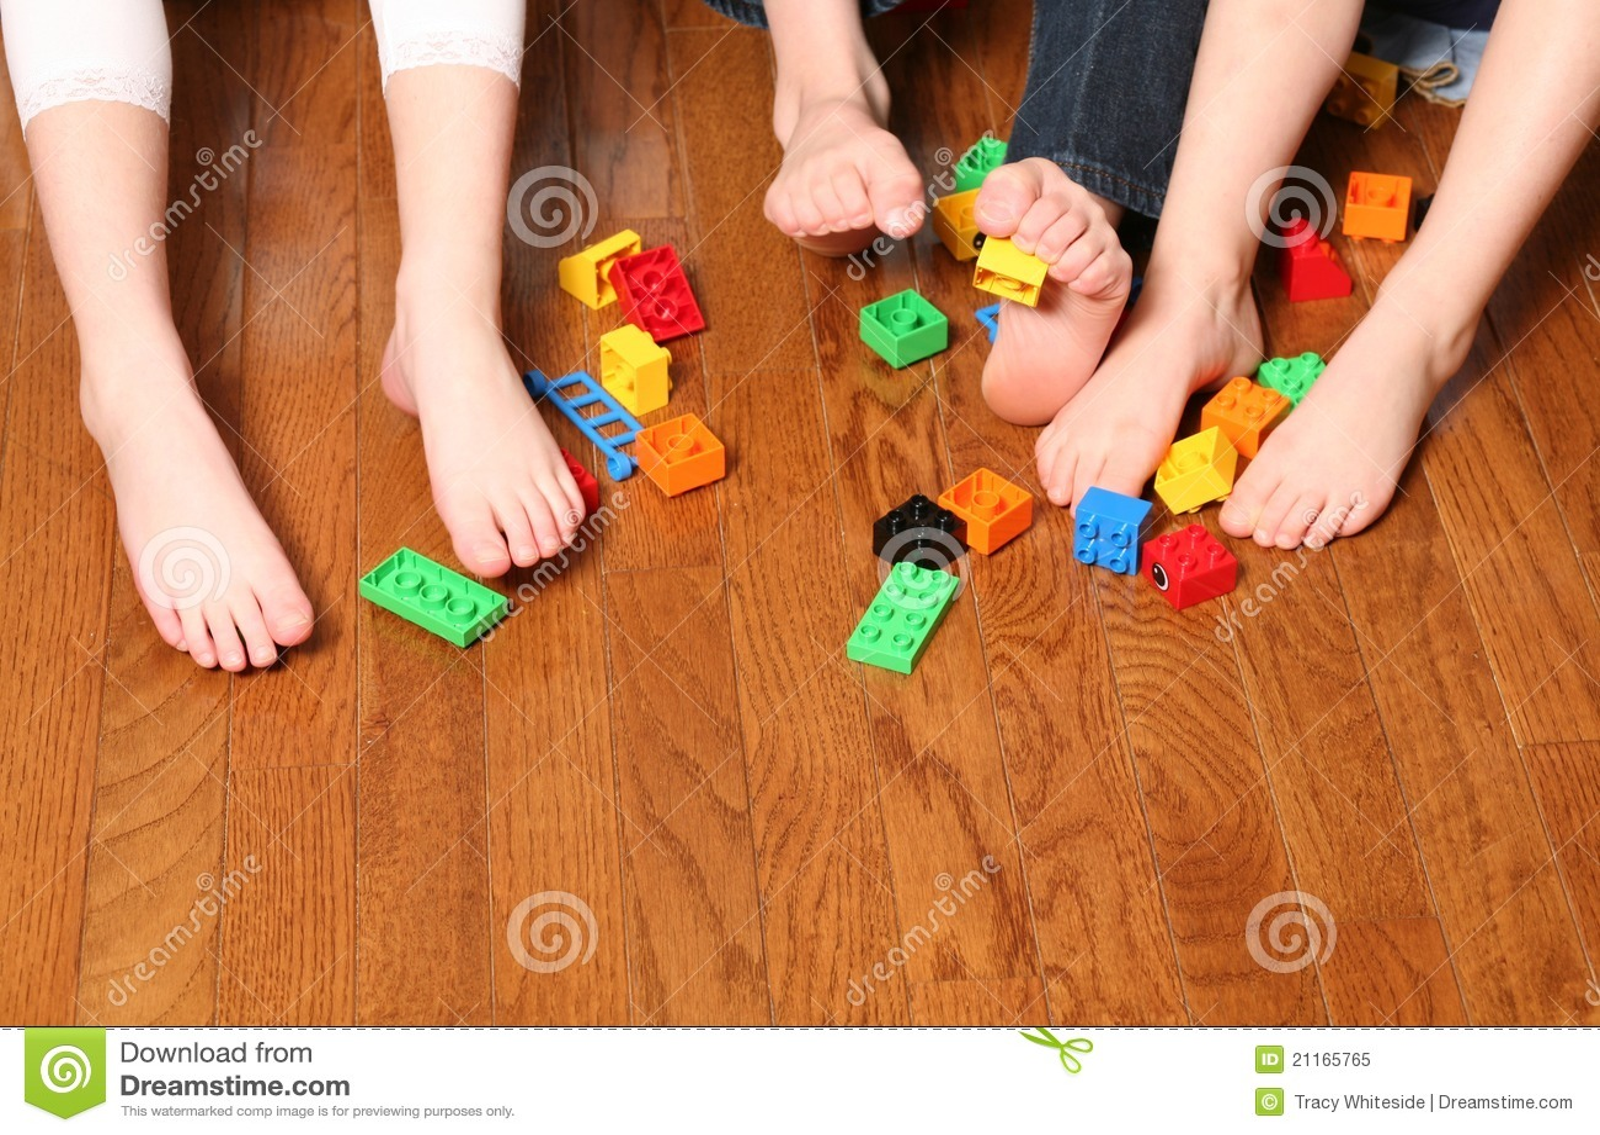 Kids Feet Pickup Up Blocks Royalty Free Stock Photo